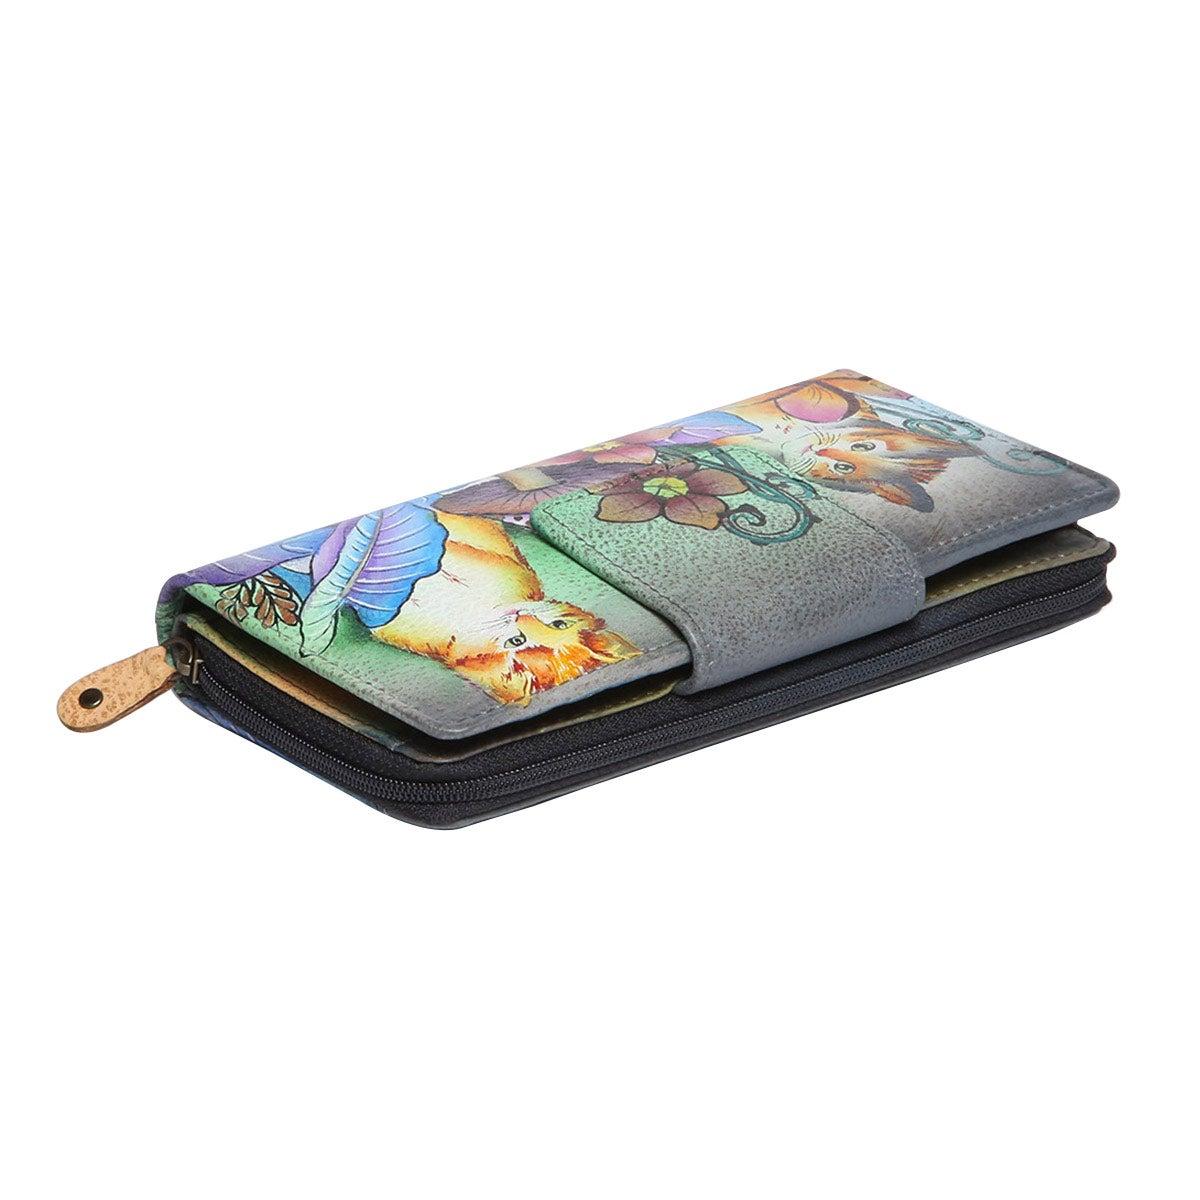 Printed lthr CatsInWonderland wallet